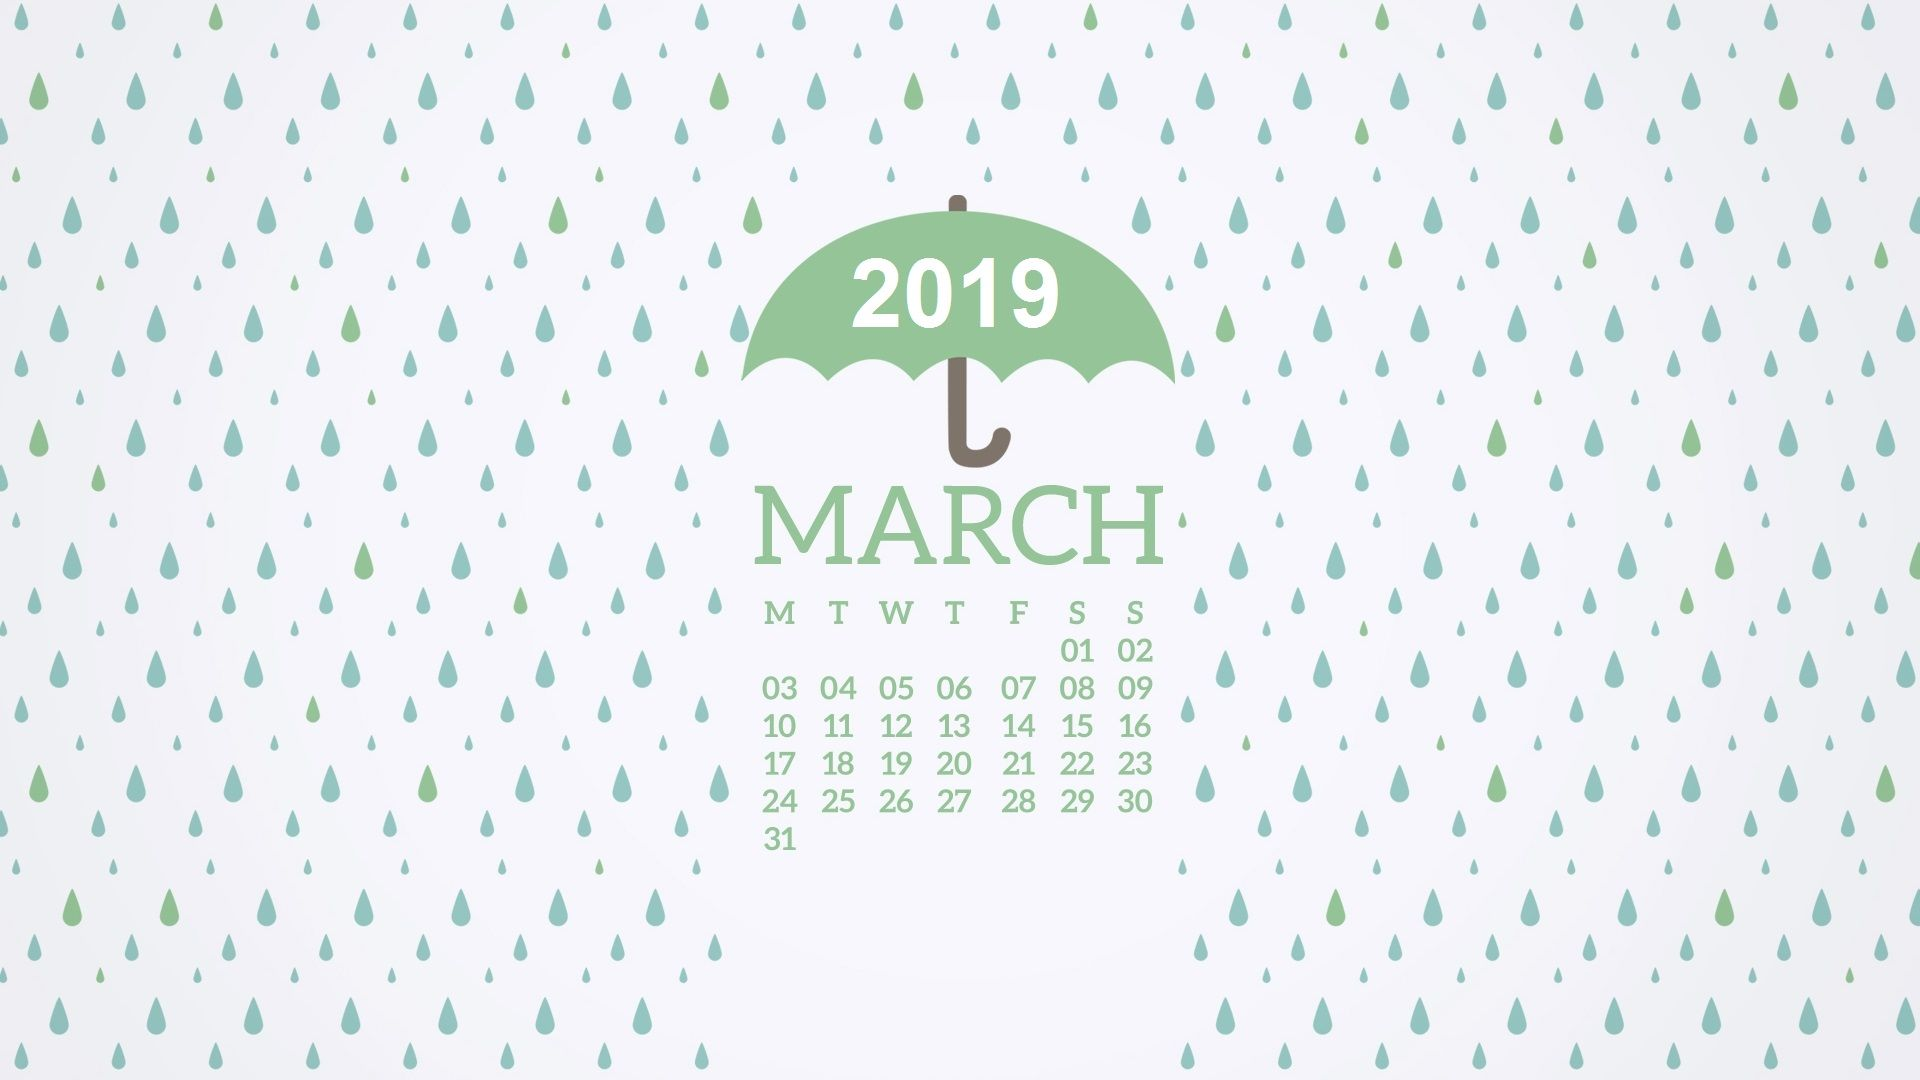 March 2019 Screensaver Wallpaper Calendar